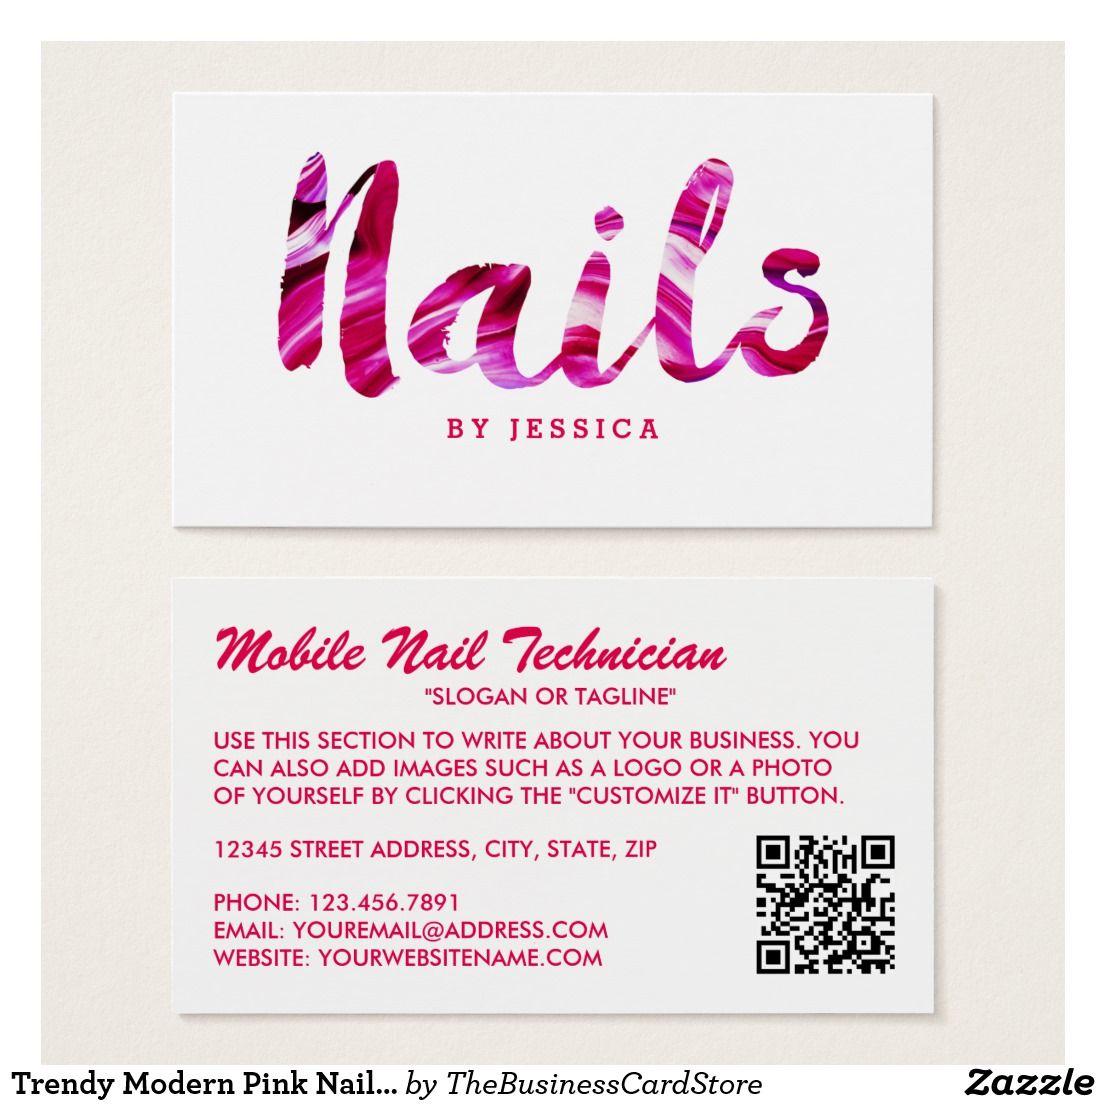 Trendy Modern Pink Nail Technician Business Card